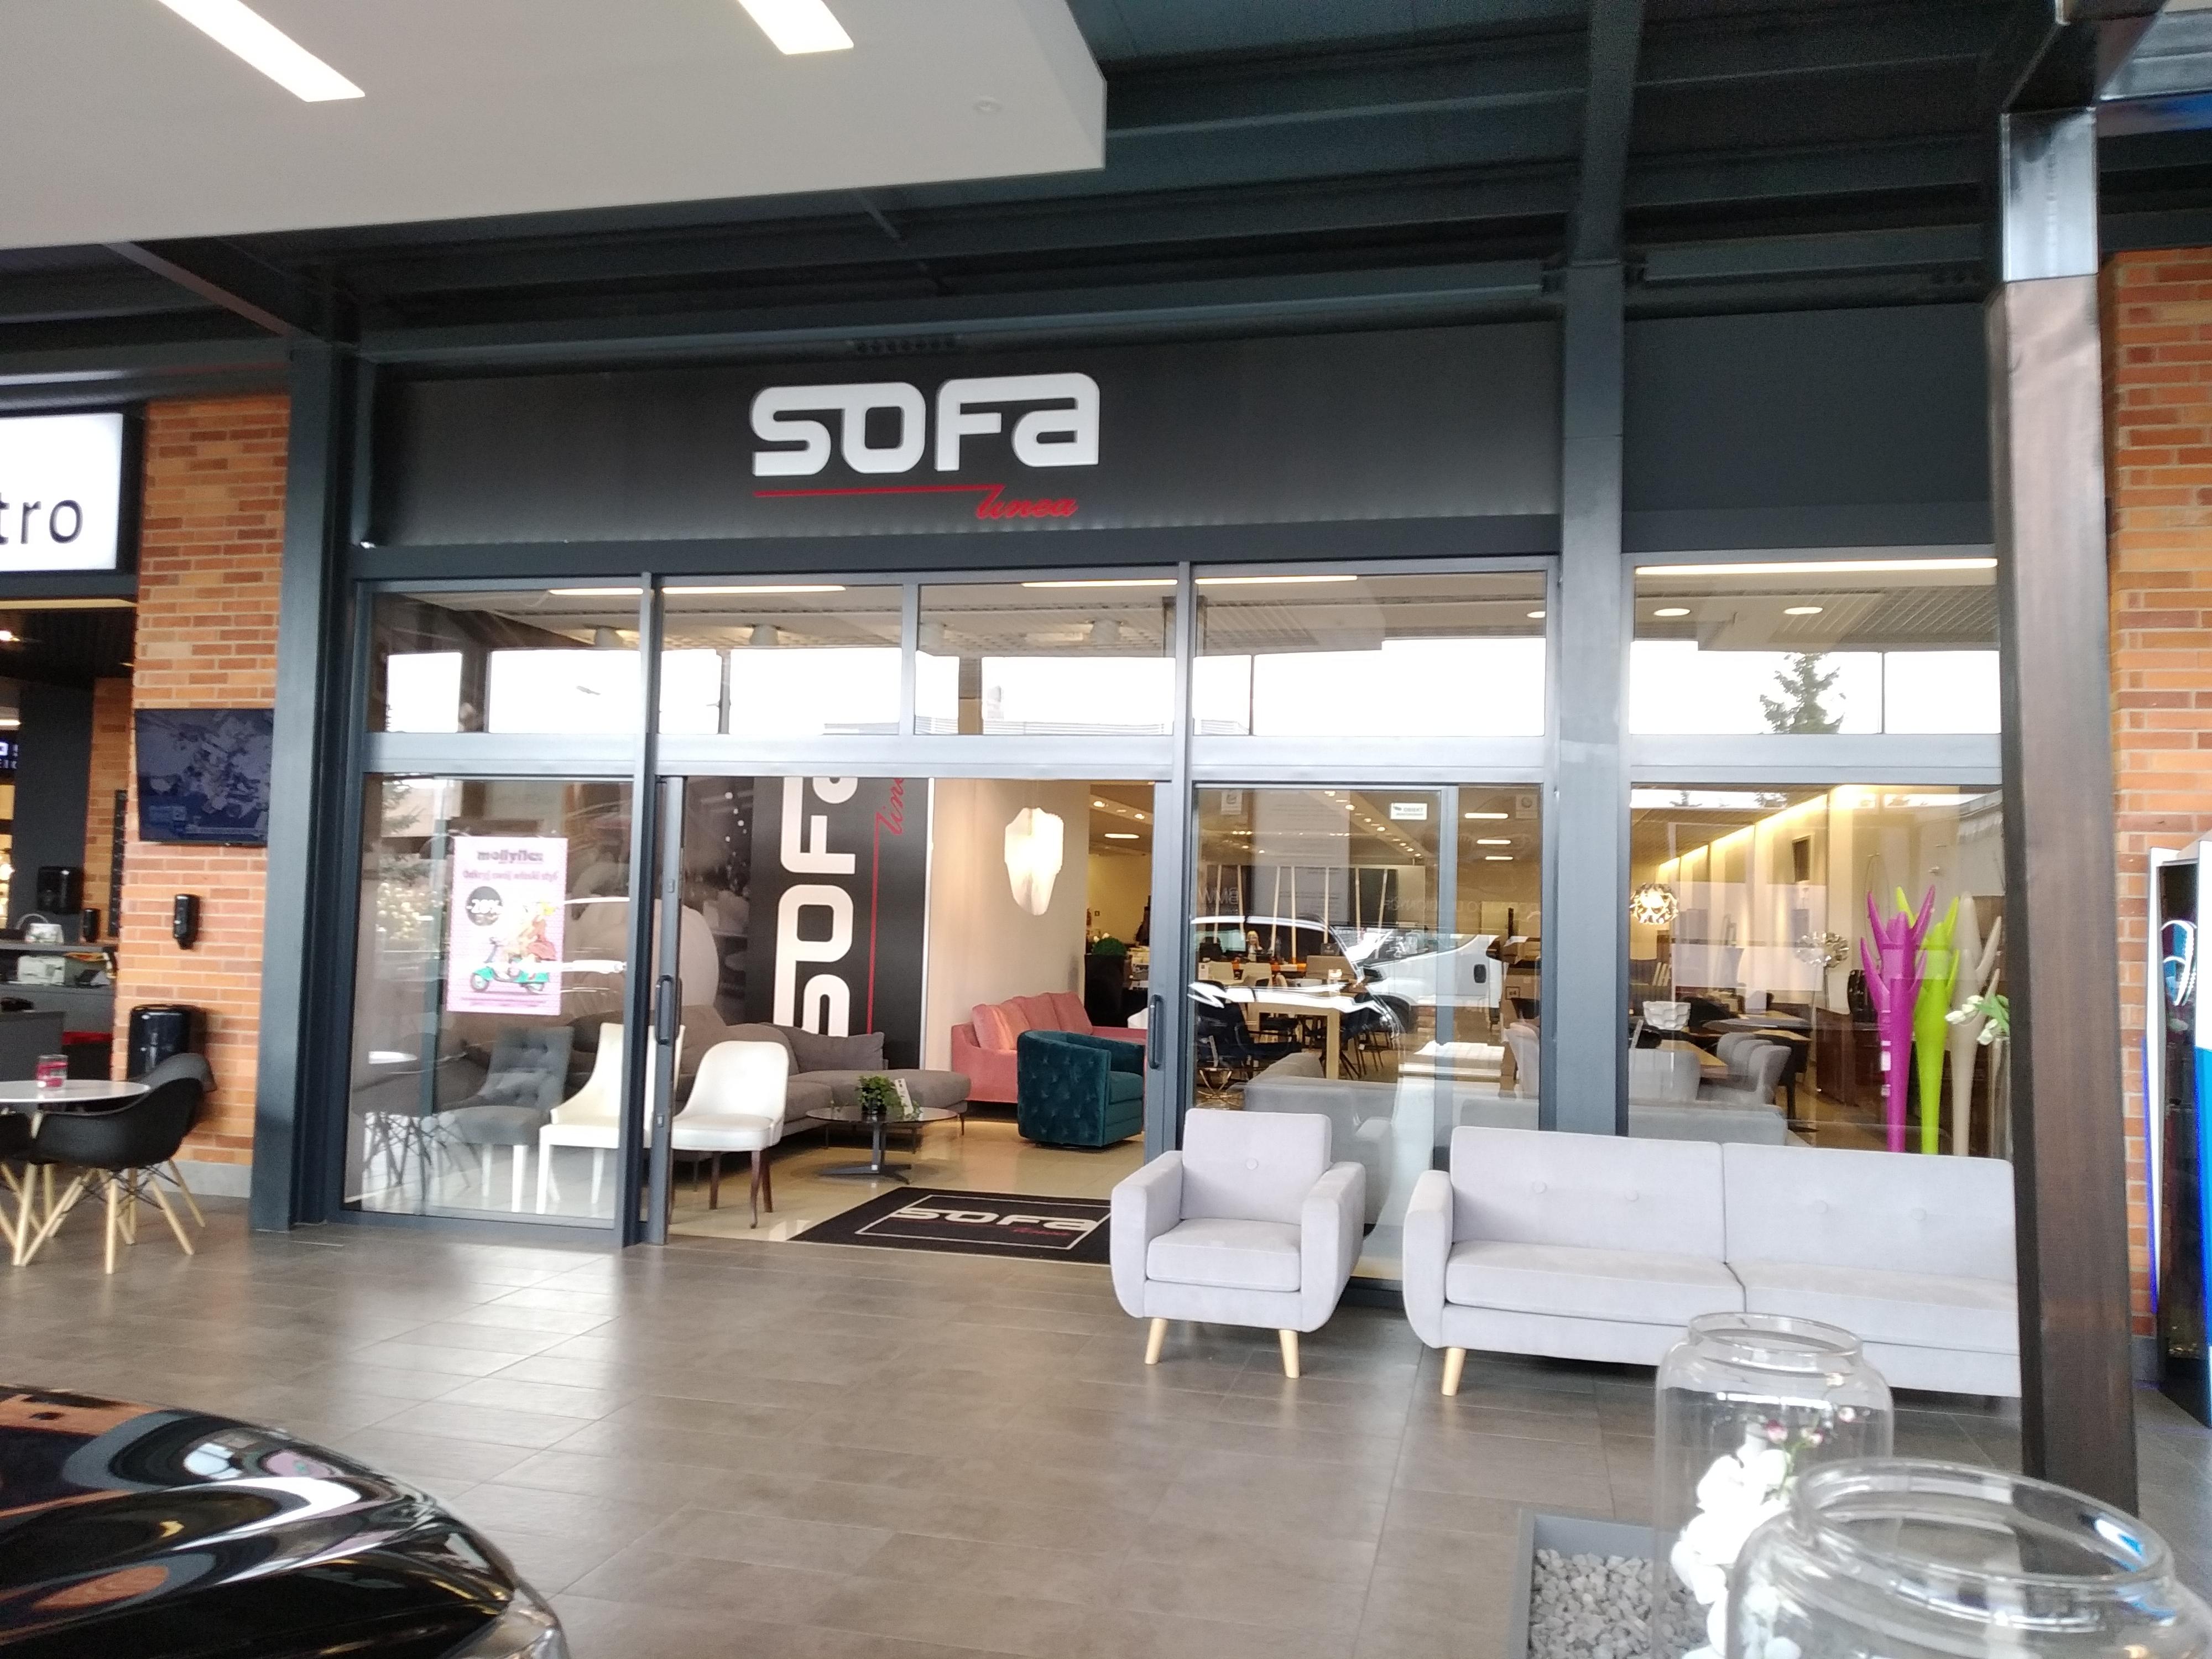 Salon meblowy SOFA-LINEA Gliwice